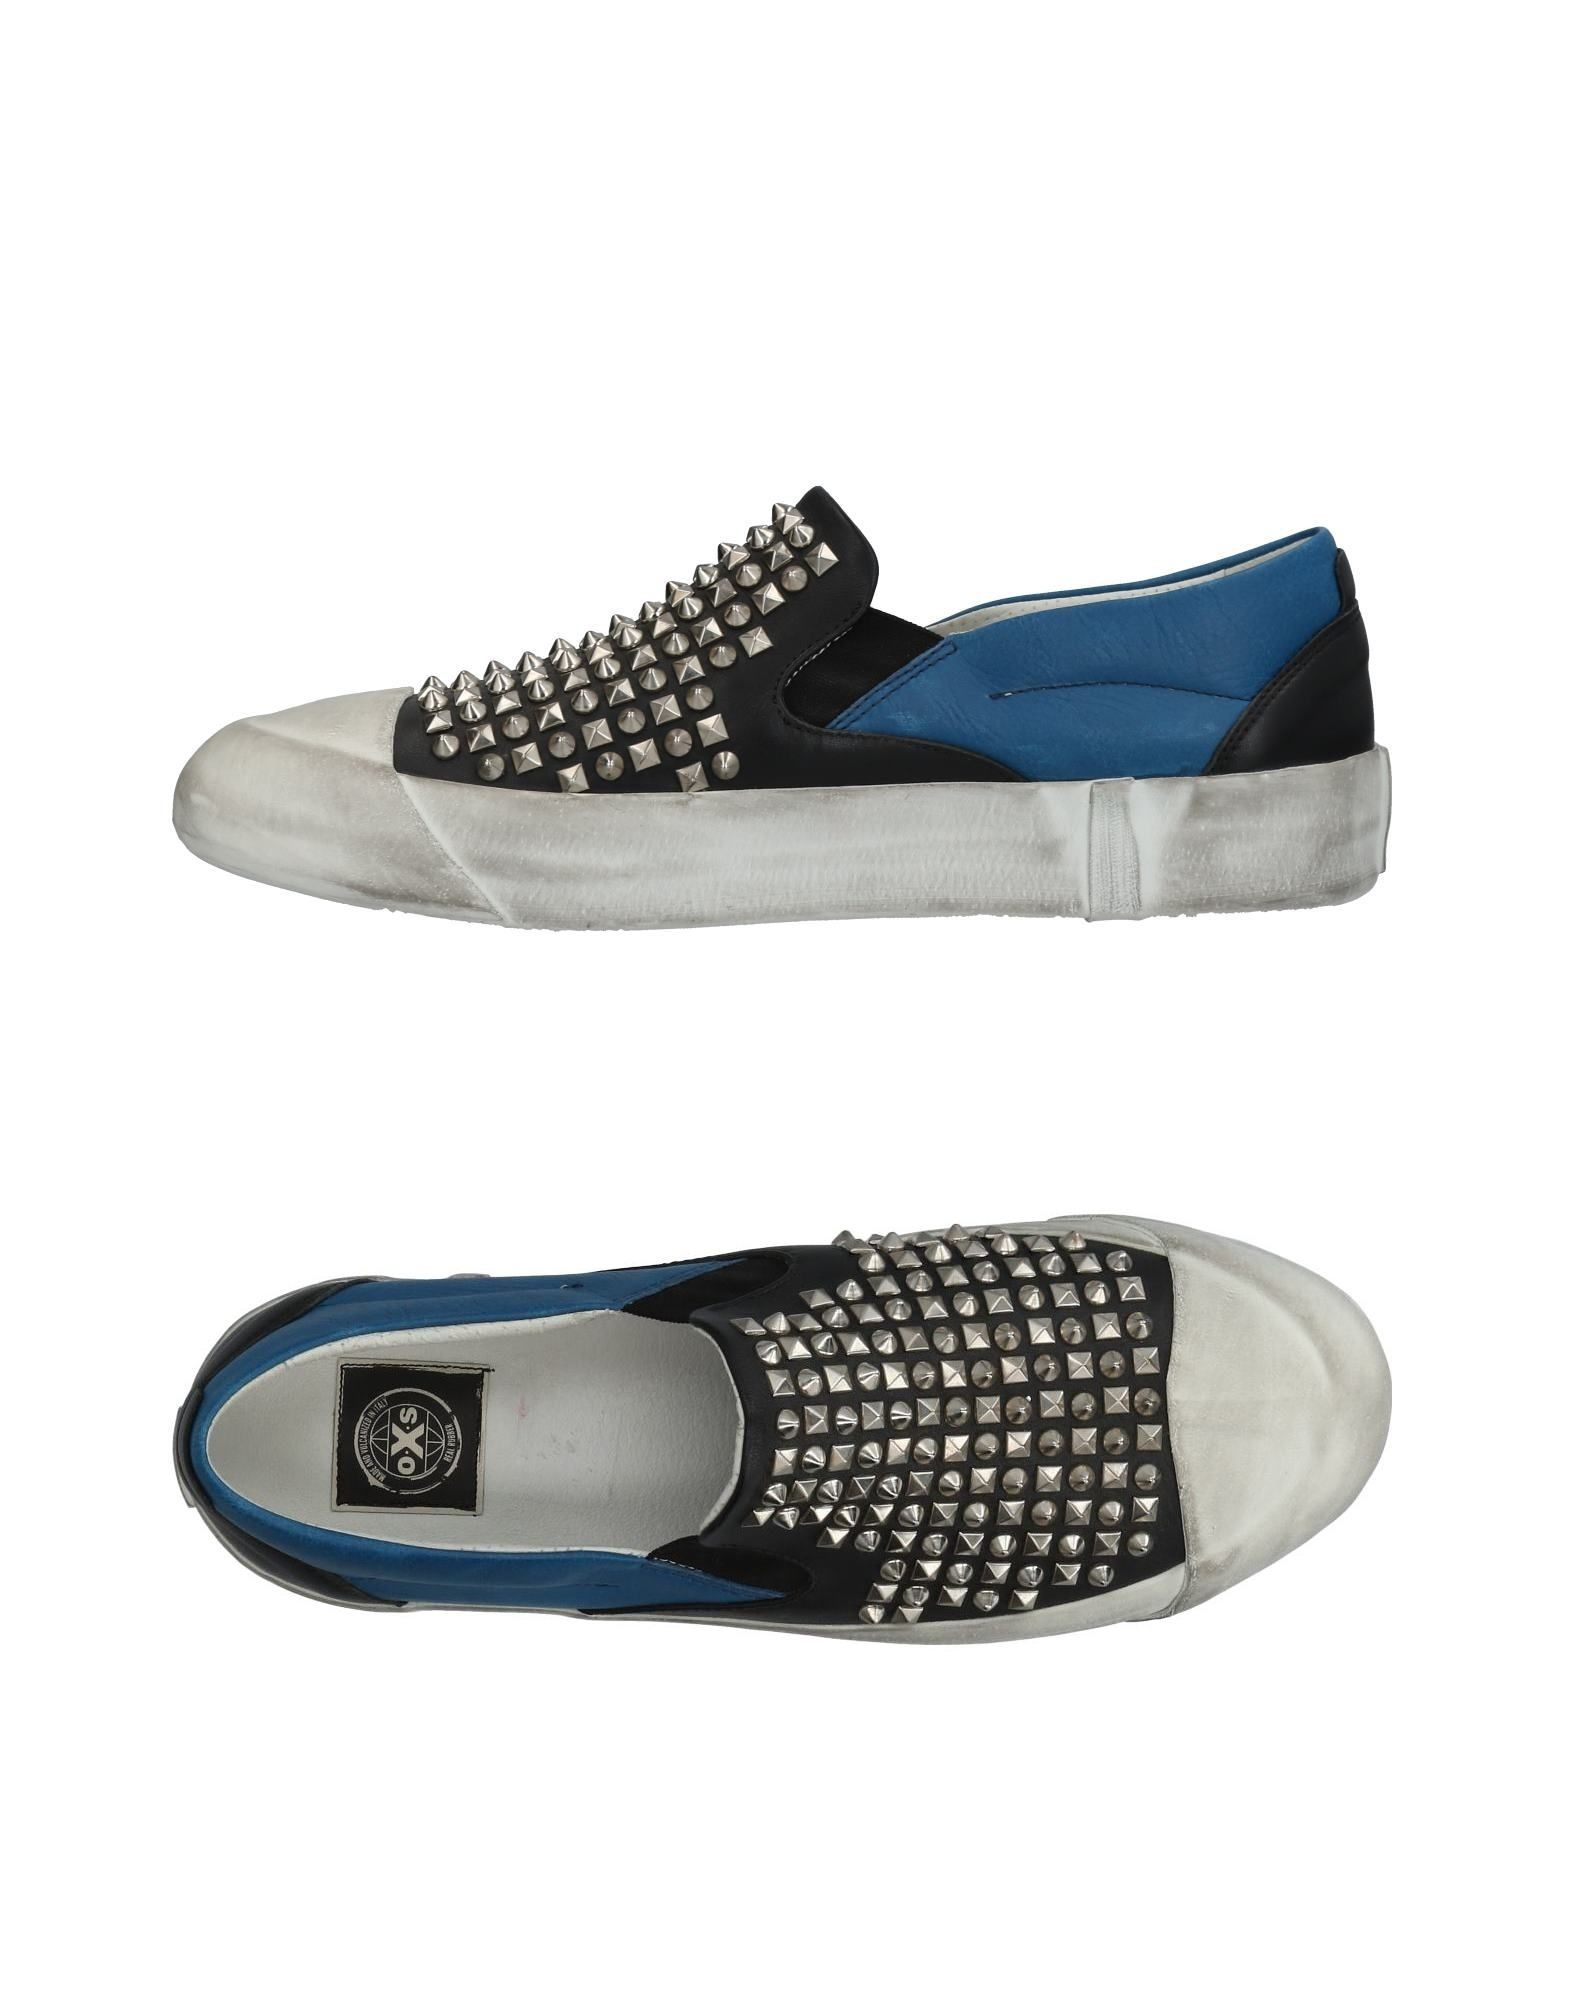 O.X.S. Sneakers Herren  11455771UL Heiße Schuhe